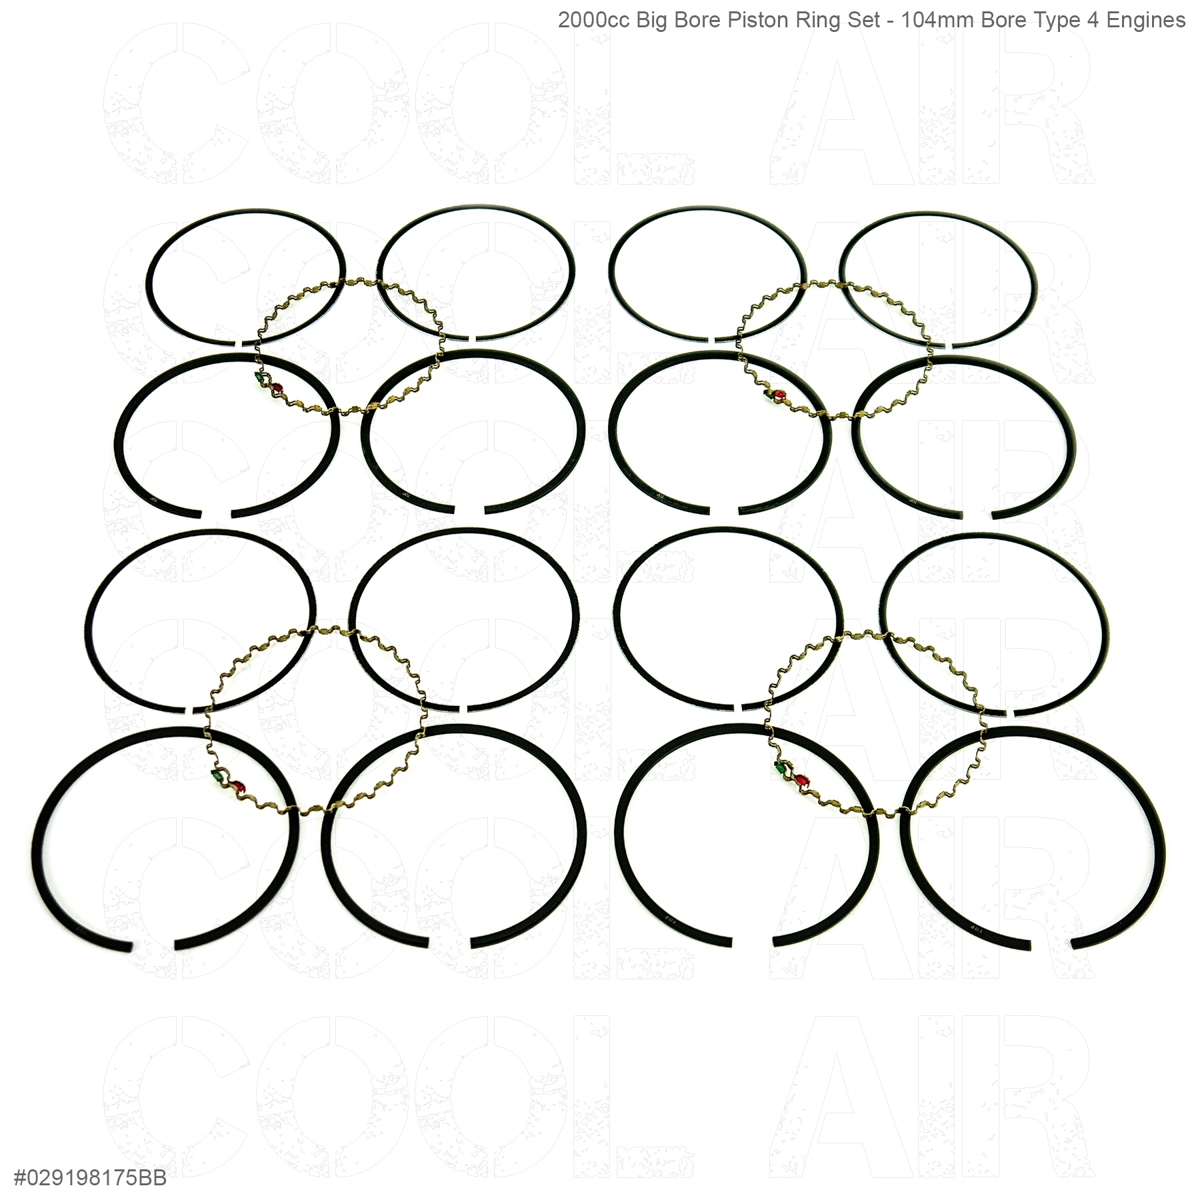 2413cc Big Bore Piston Ring Set - 104mm Bore Type 4 Engines